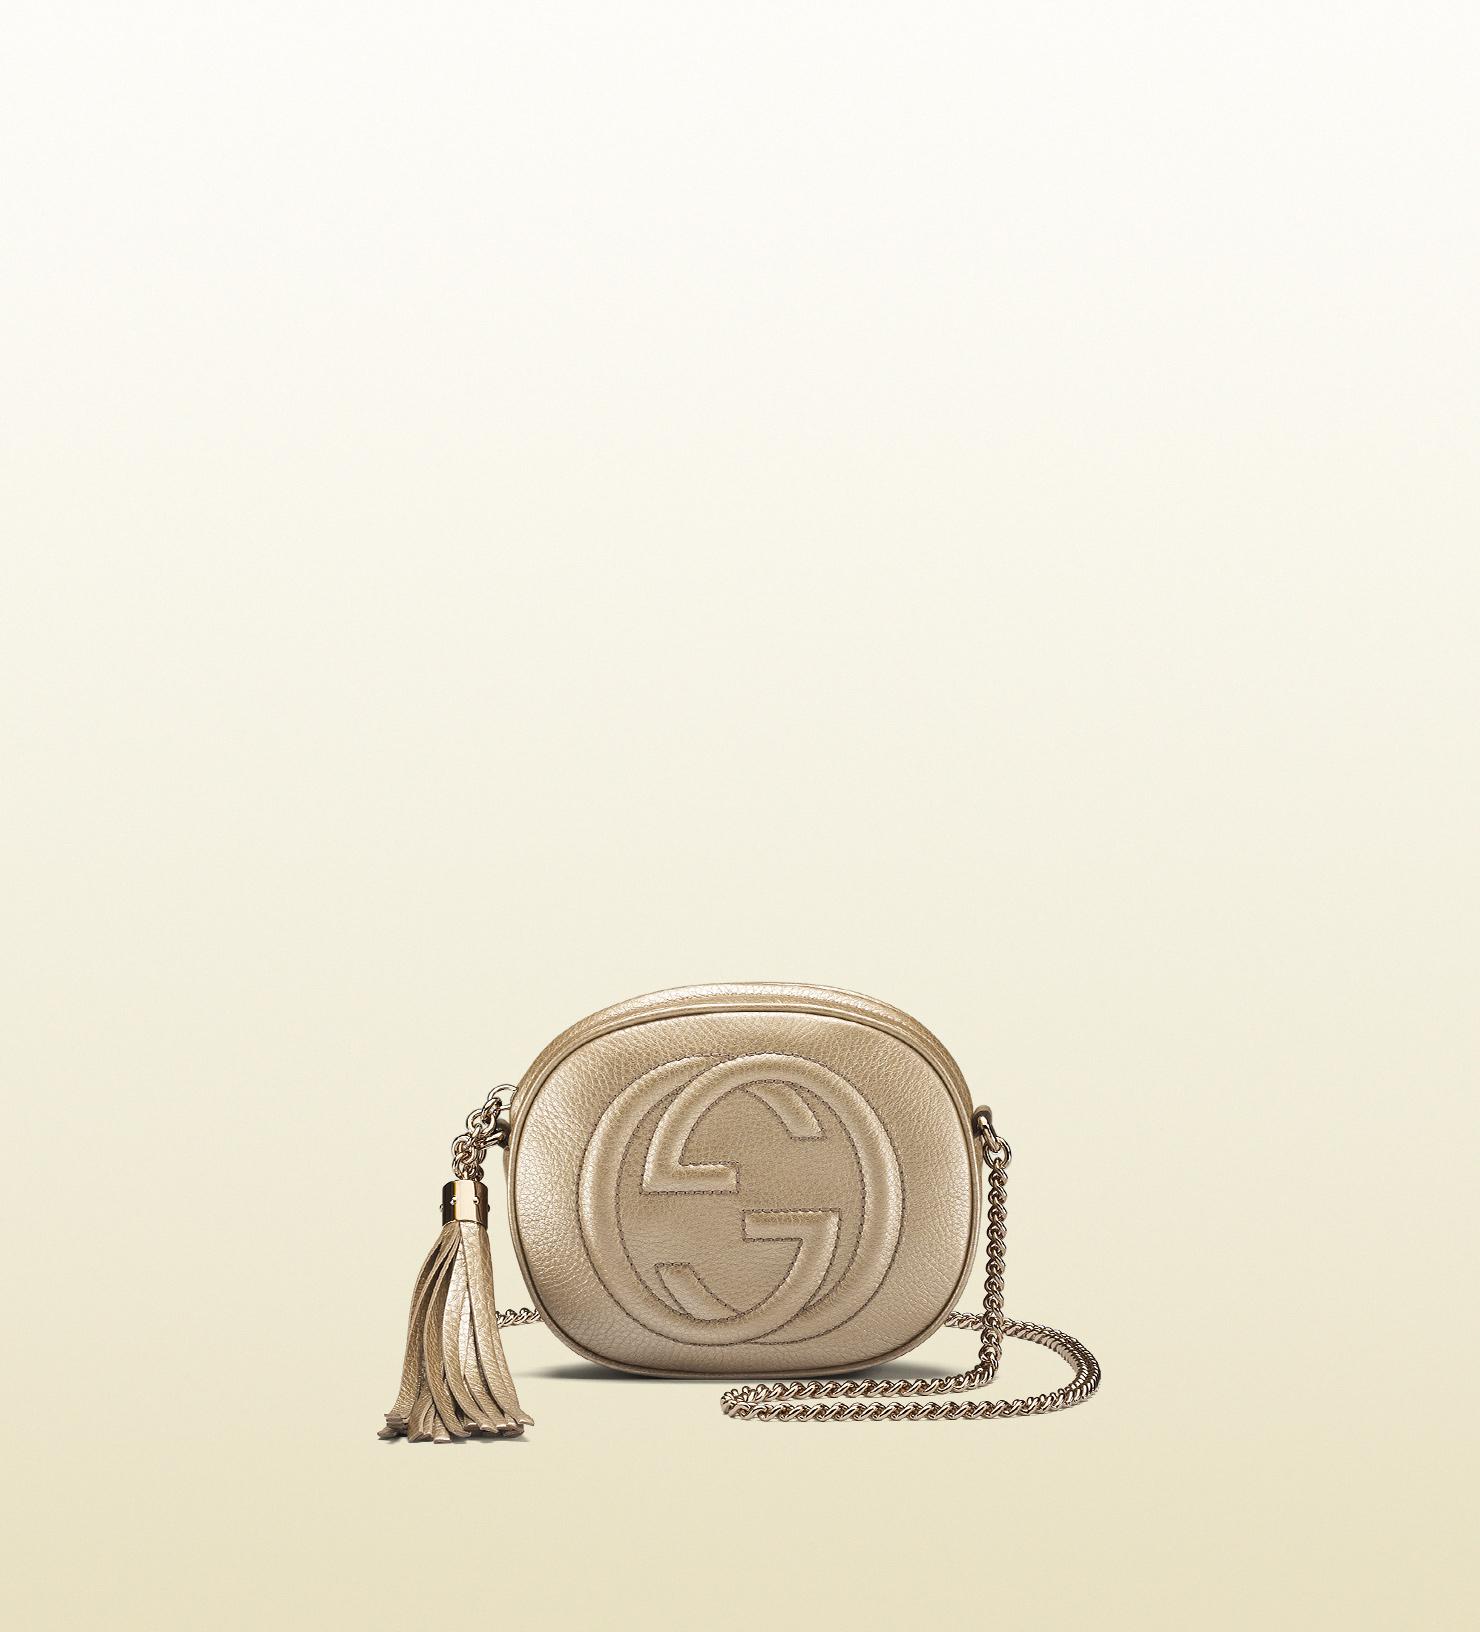 23197b89bd37 Lyst - Gucci Soho Metallic Leather Mini Chain Bag in Natural